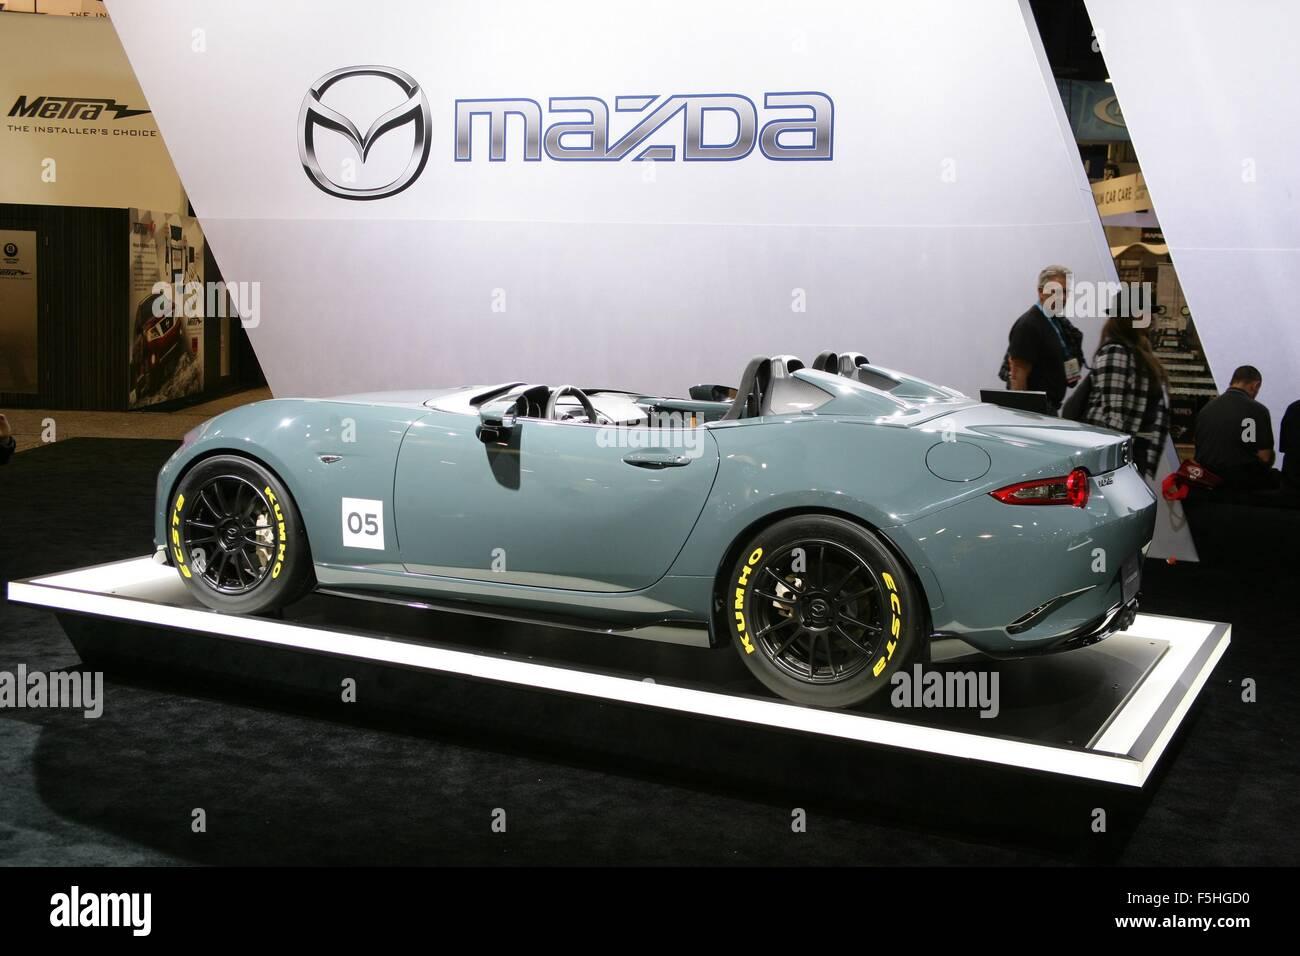 Las vegas nv usa 4th nov 2015 2016 mx 5 speedster for Pool trade show las vegas 2015